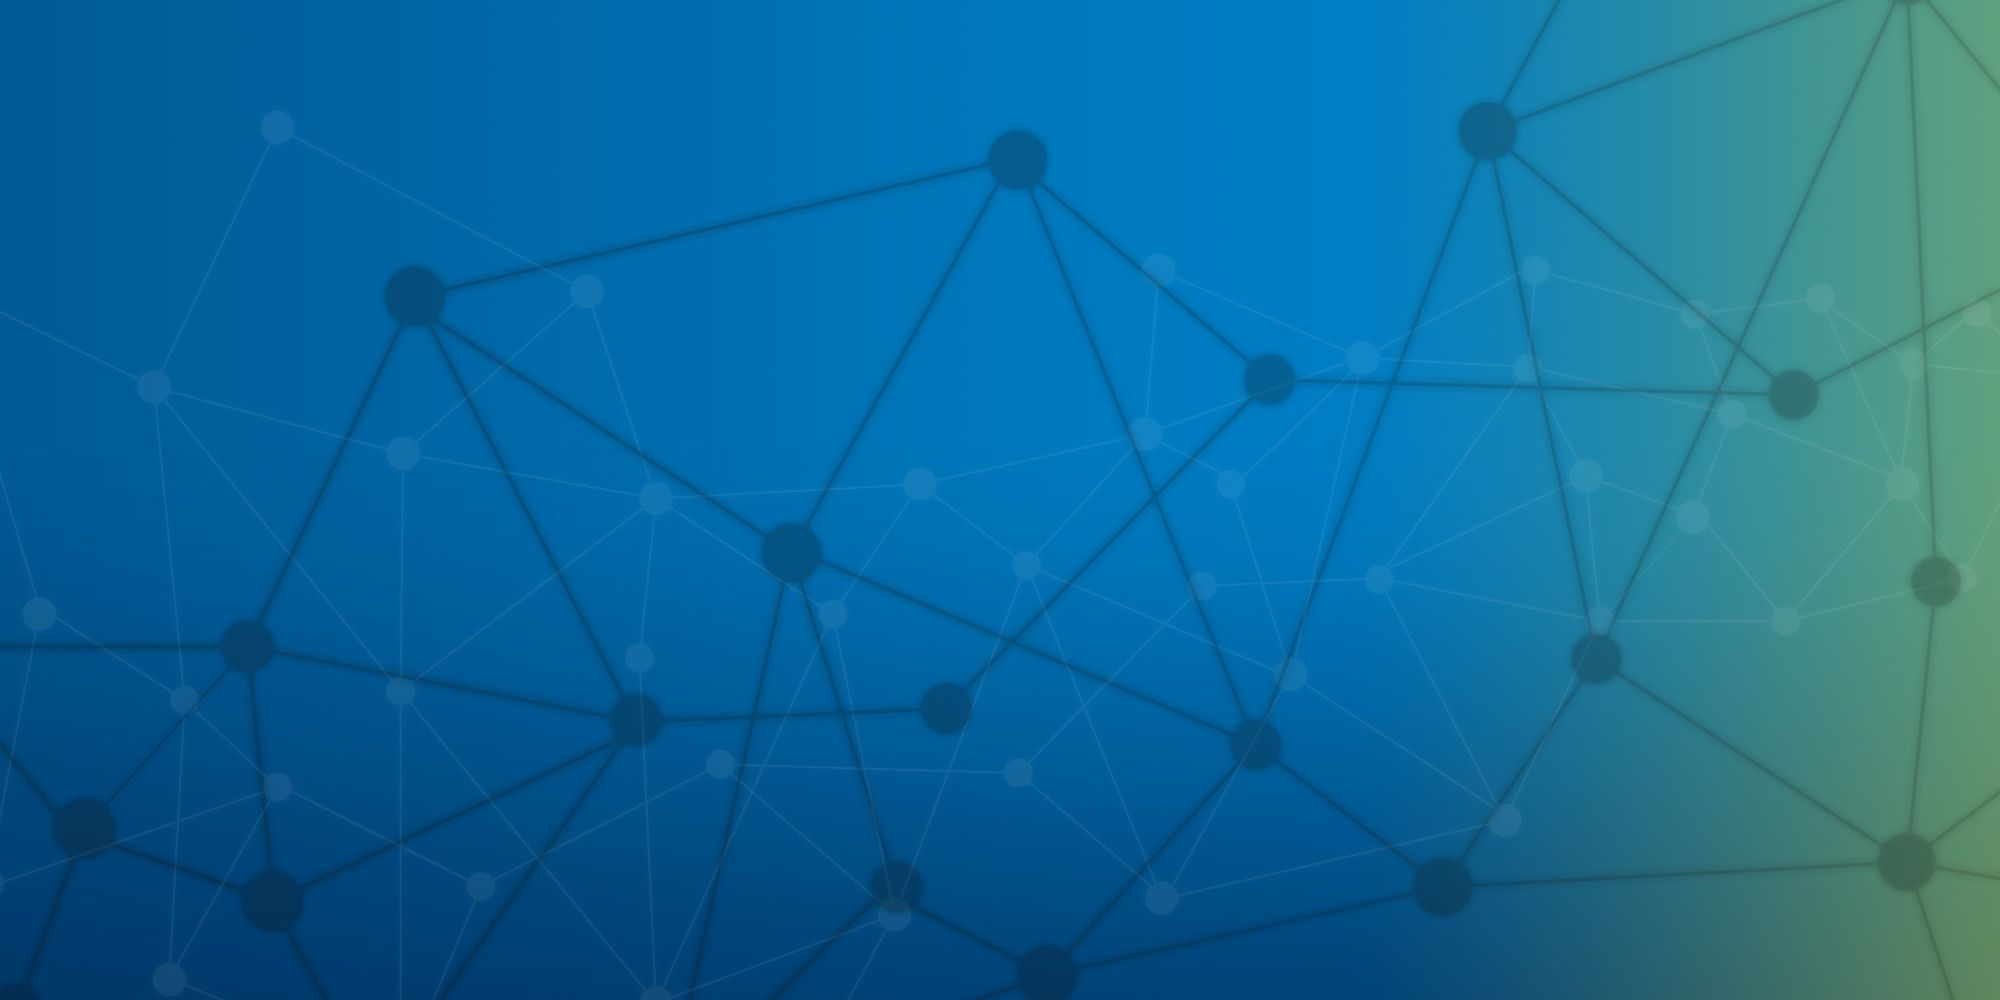 Boston Digital Analytics Meetup